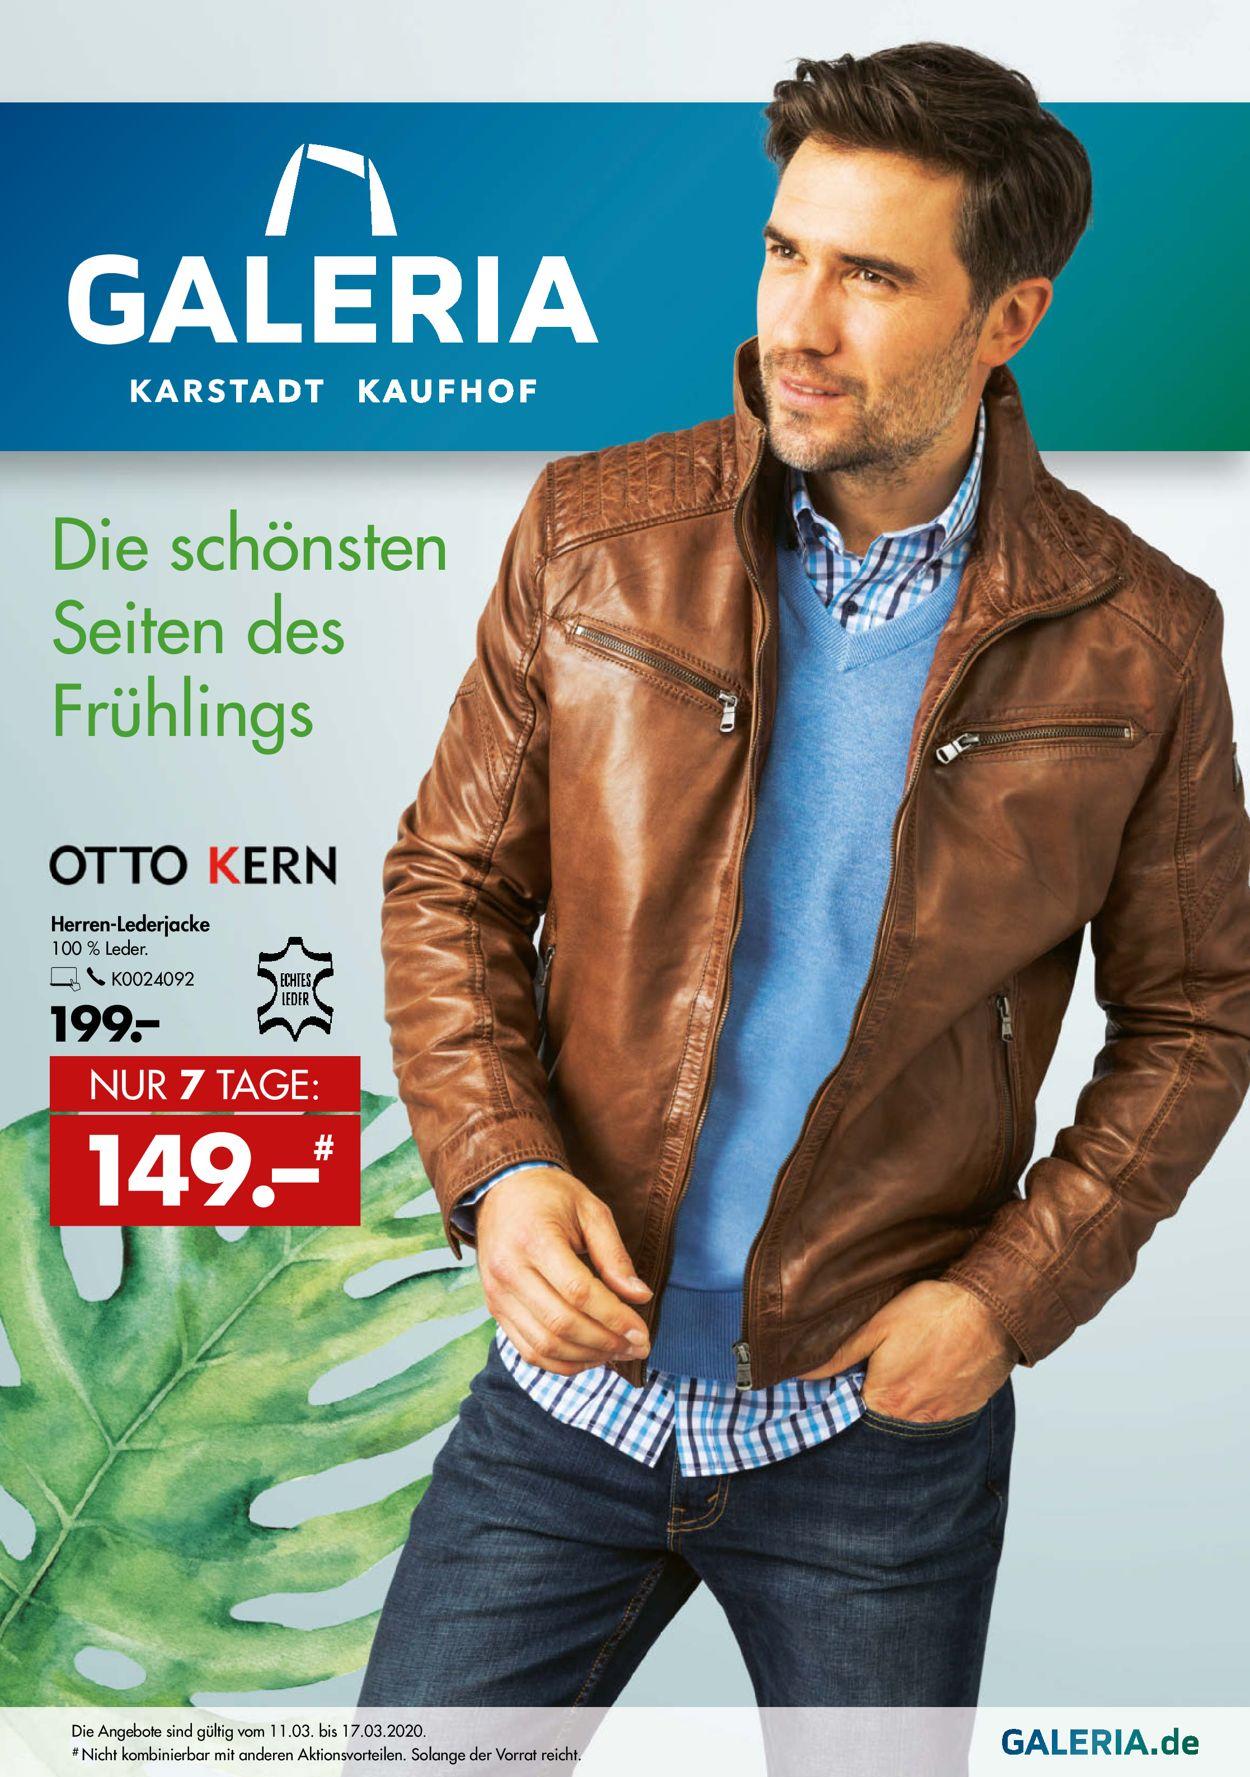 GALERIA Kaufhof Prospekt - Aktuell vom 11.03-17.03.2020